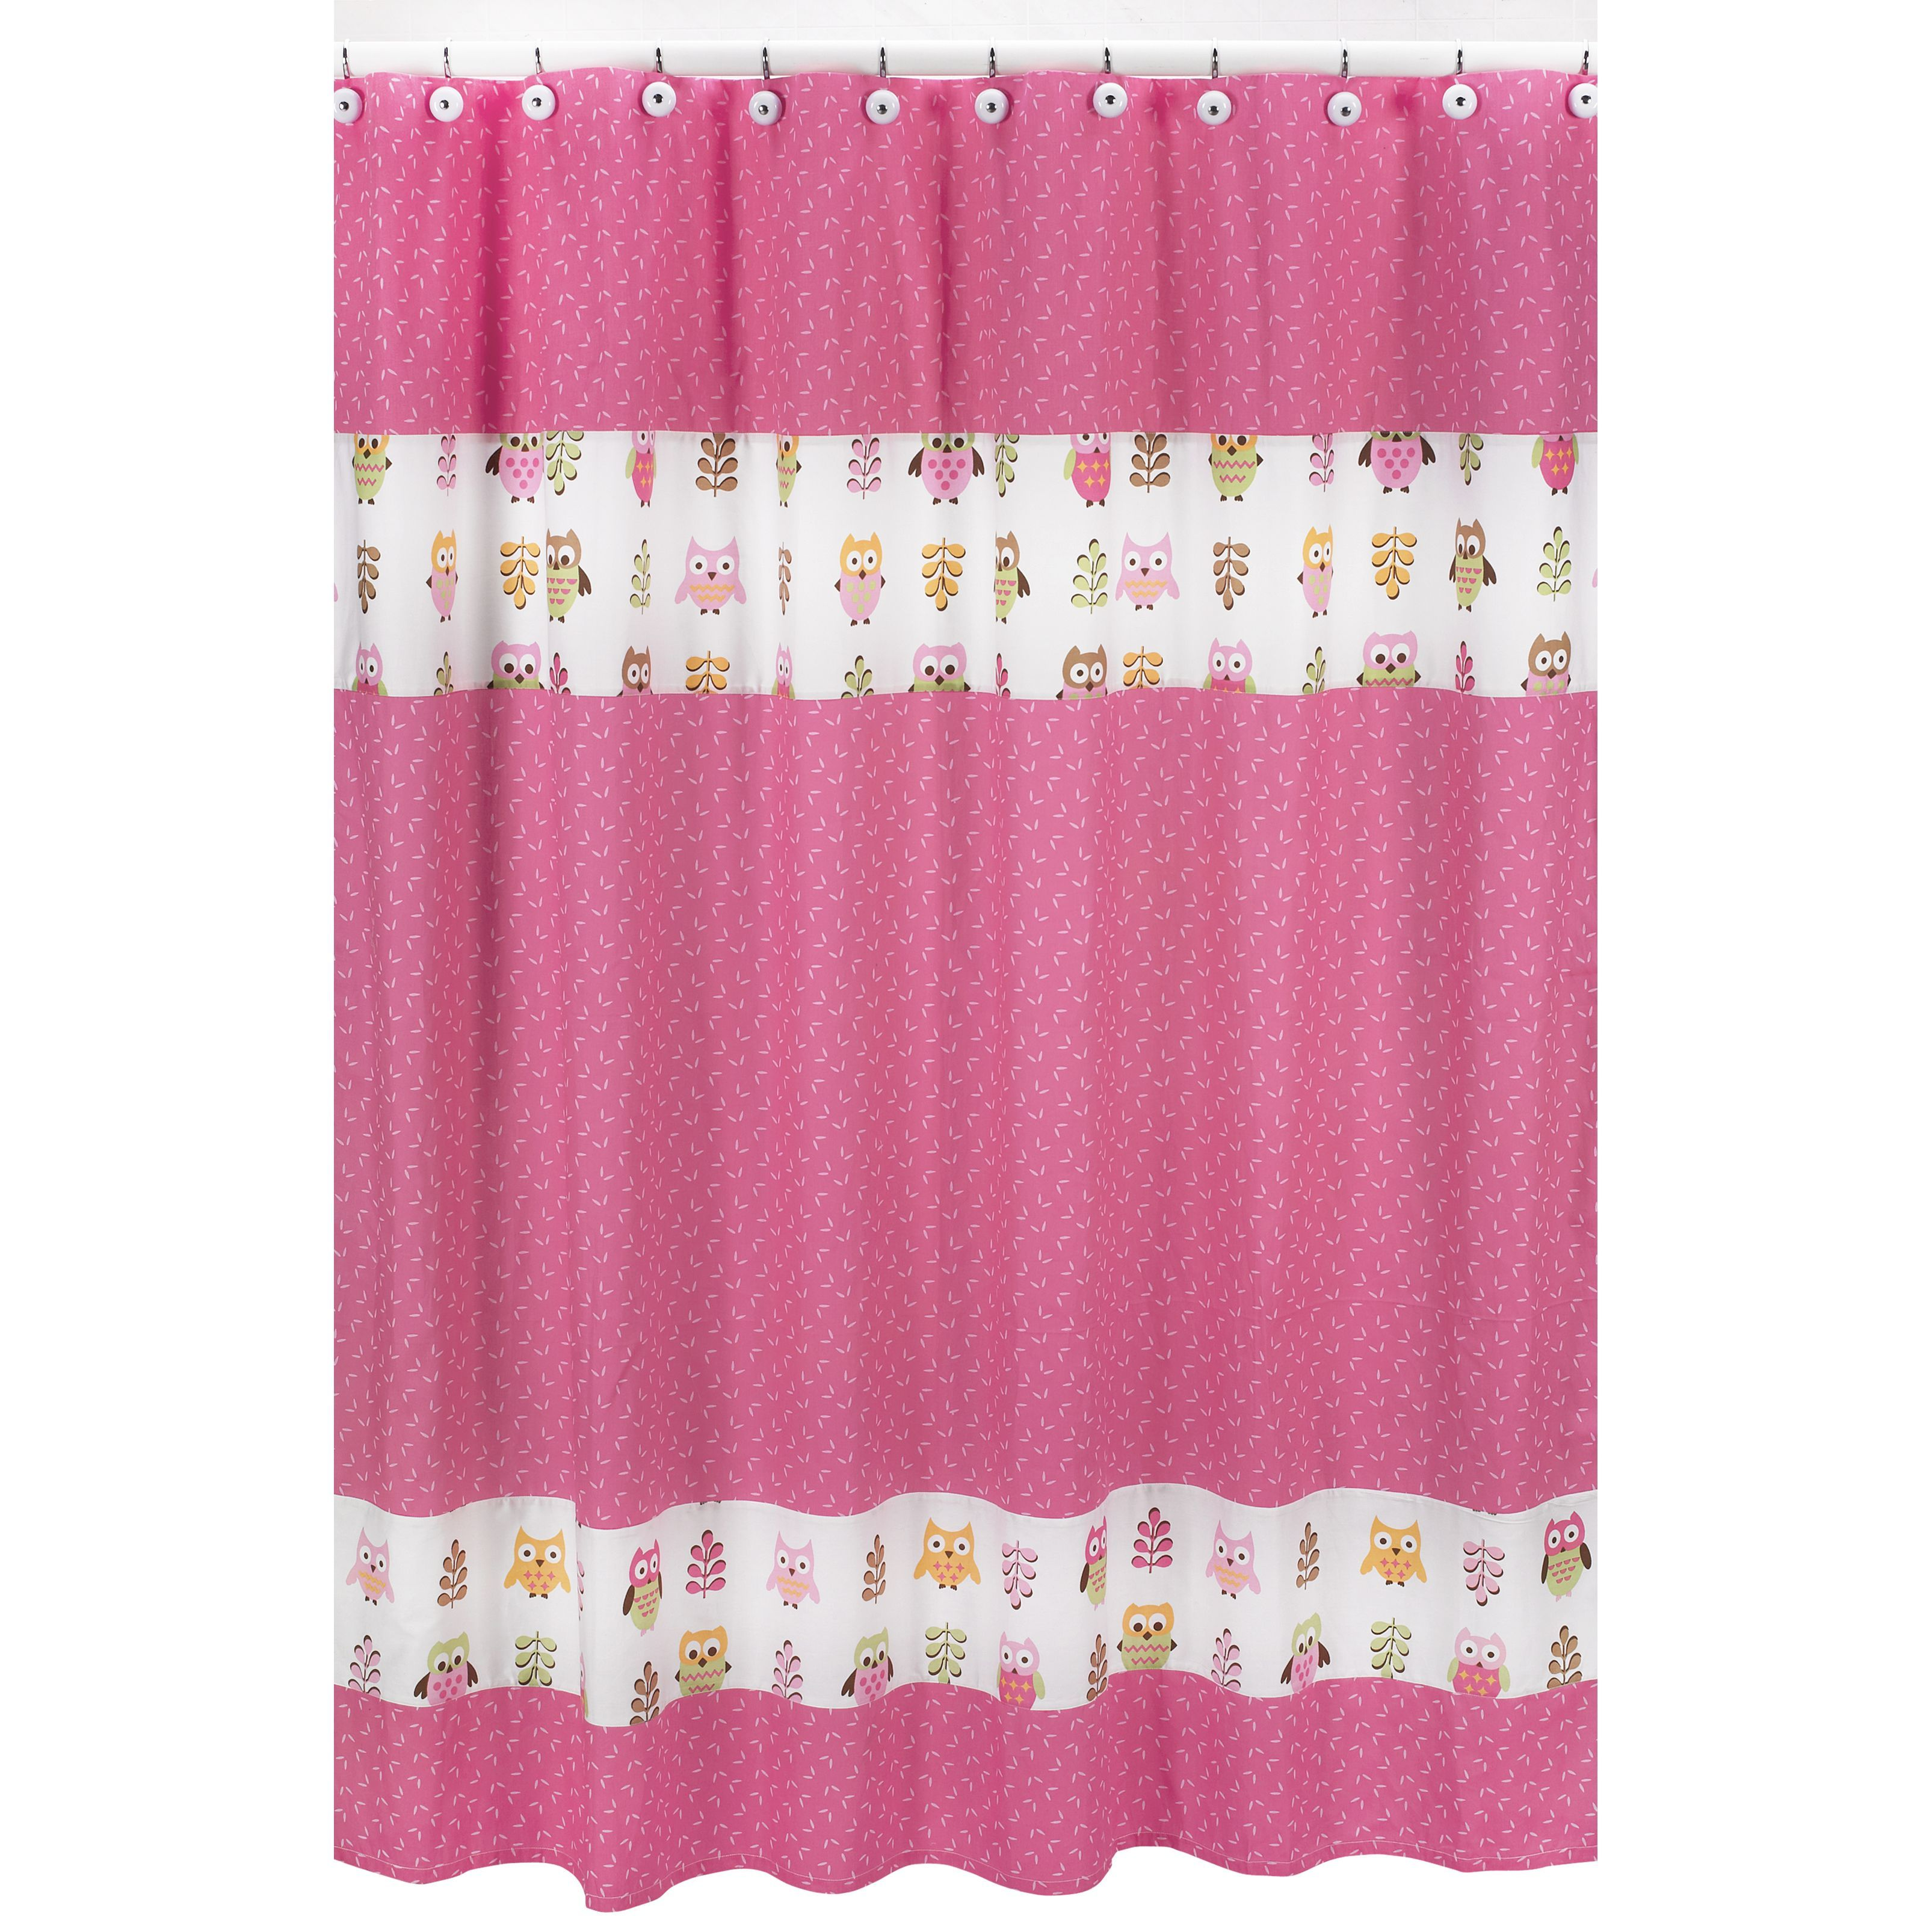 Sweet jojo designs pink happy owl kids shower curtain products